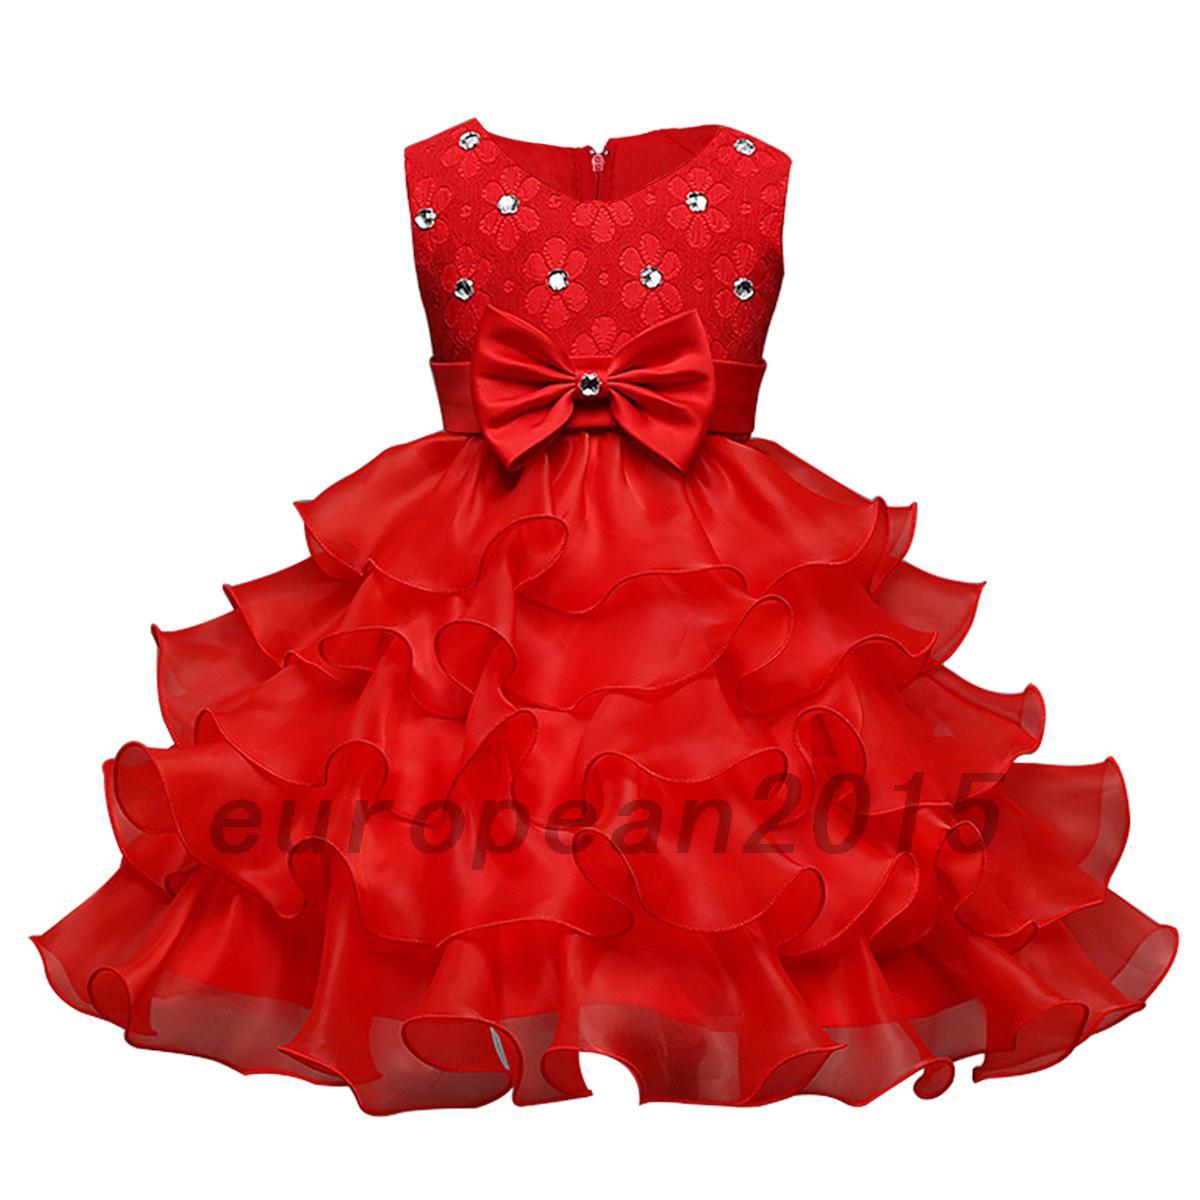 robe princesse n ud papillon c r monie mariage soir e anniversaire filles jupe ebay. Black Bedroom Furniture Sets. Home Design Ideas